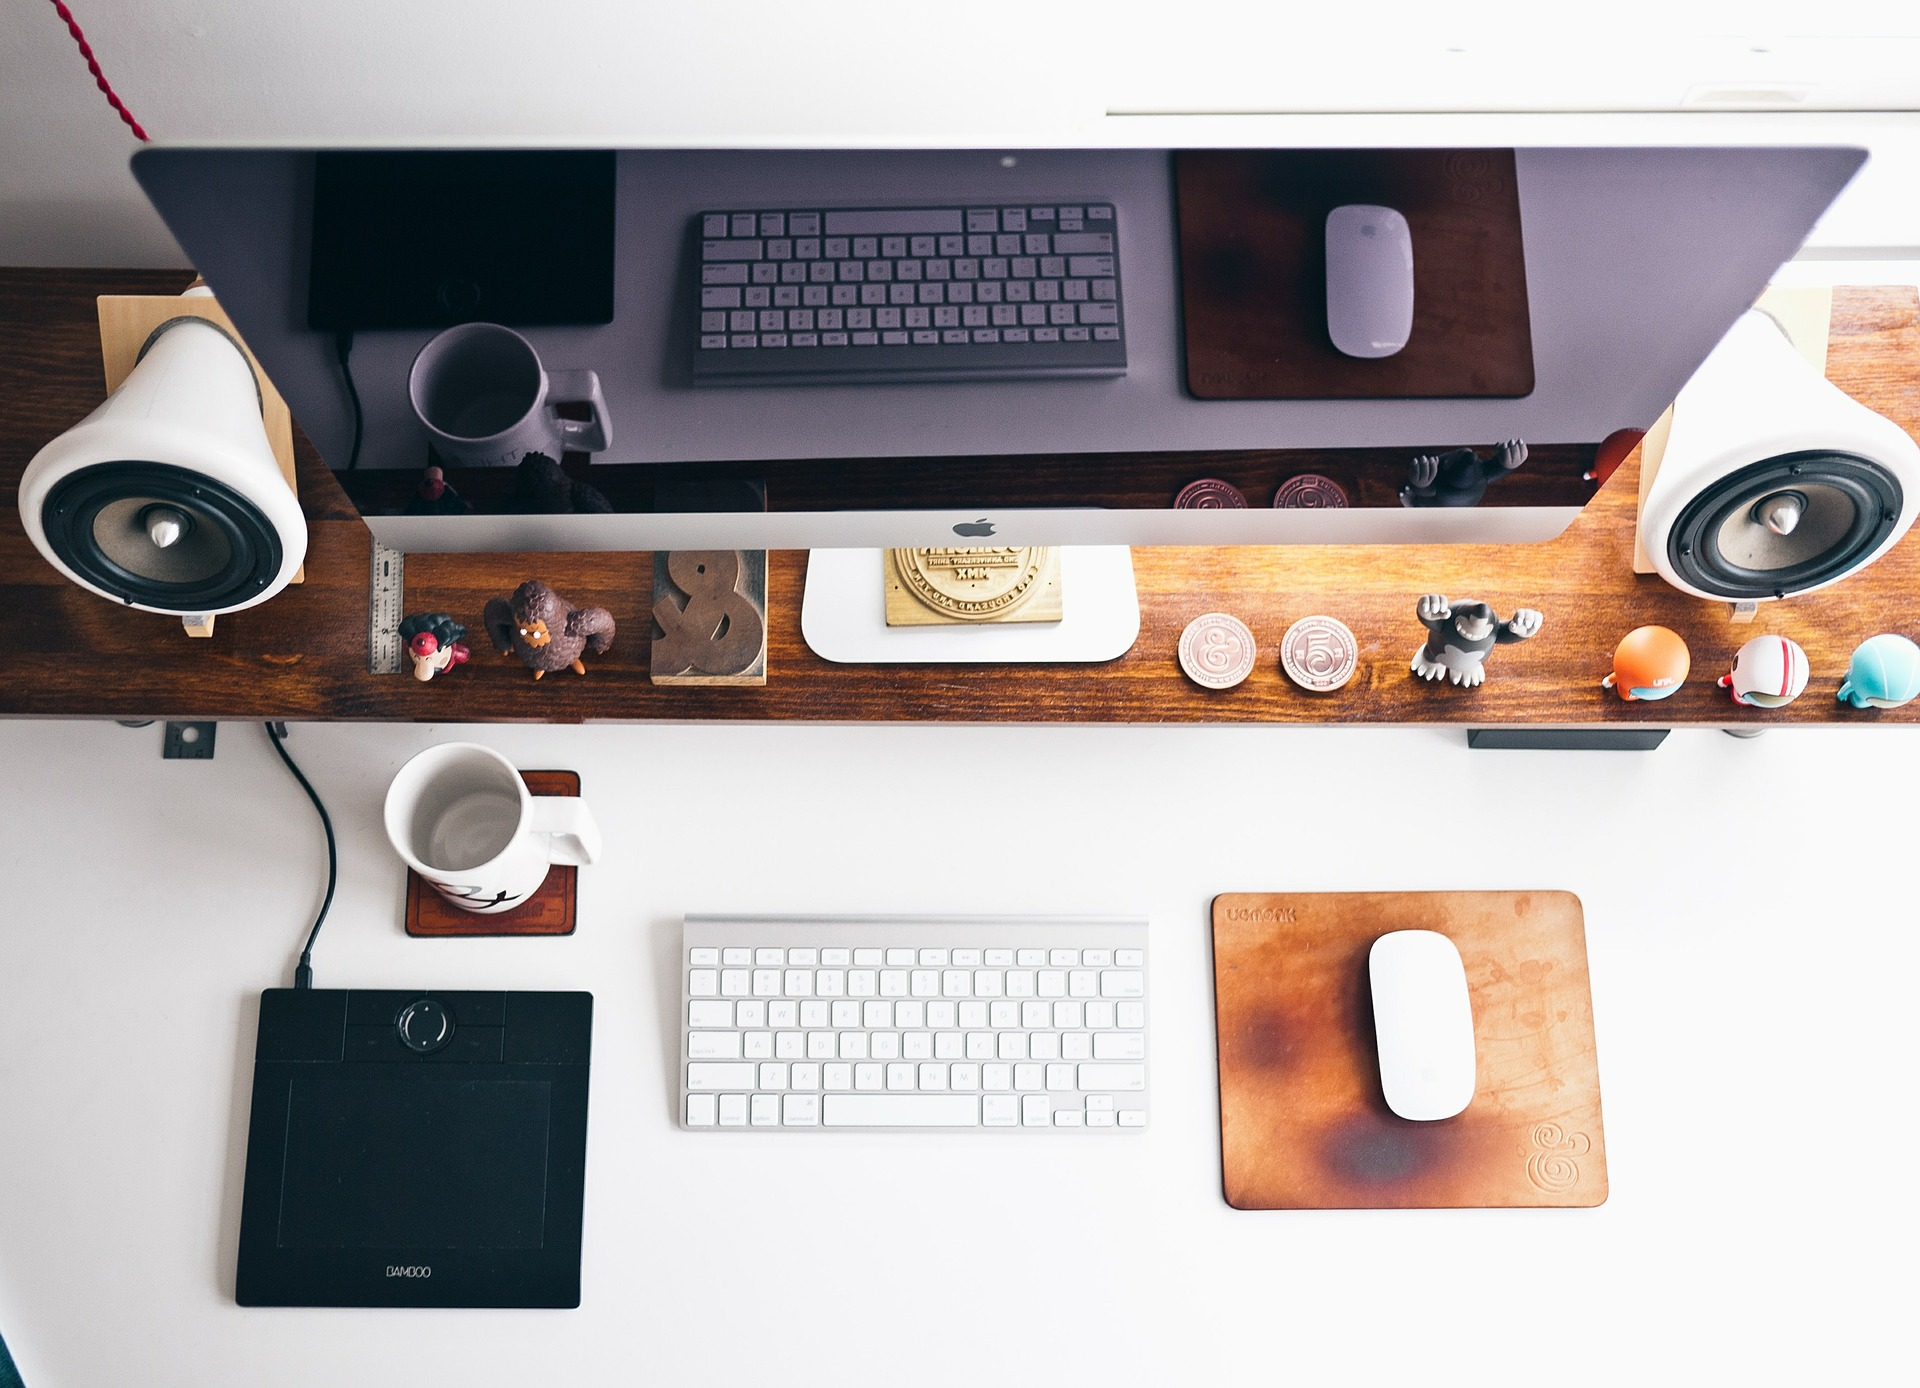 Cara Mengubah Sensitivitas Kursor Mouse pada Windows